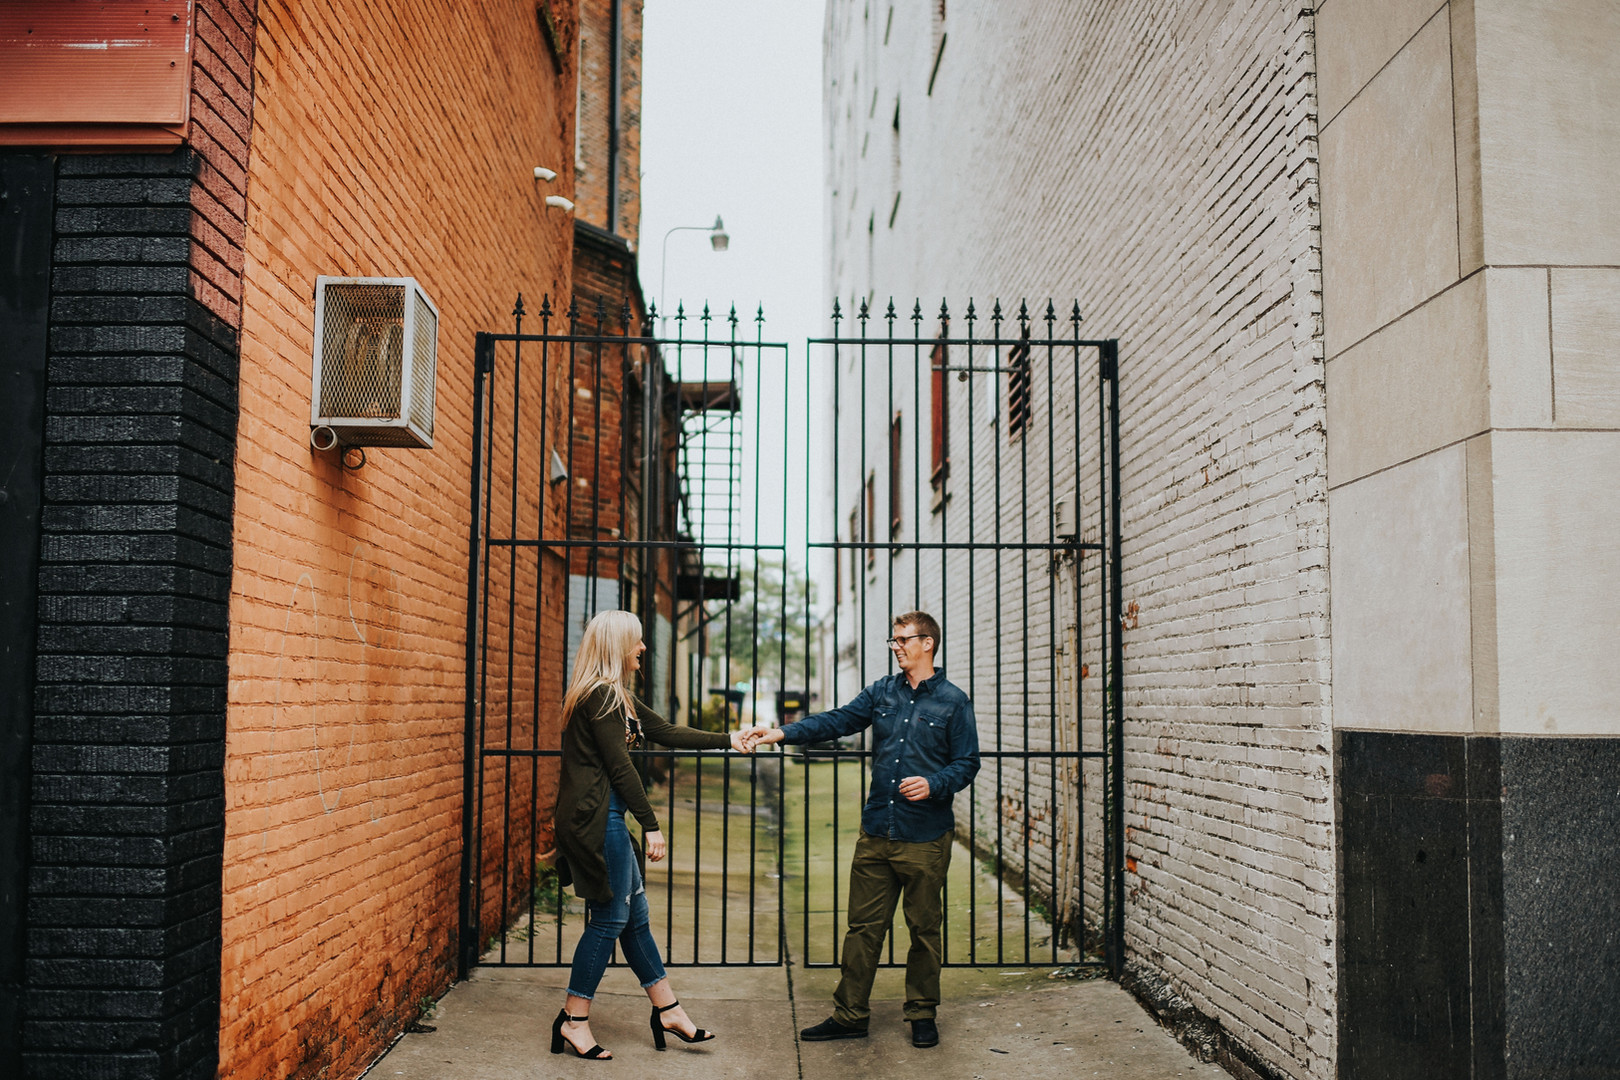 La Crosse Wisconsin Outdoor Unposed Lifestyle Engagement Photographer